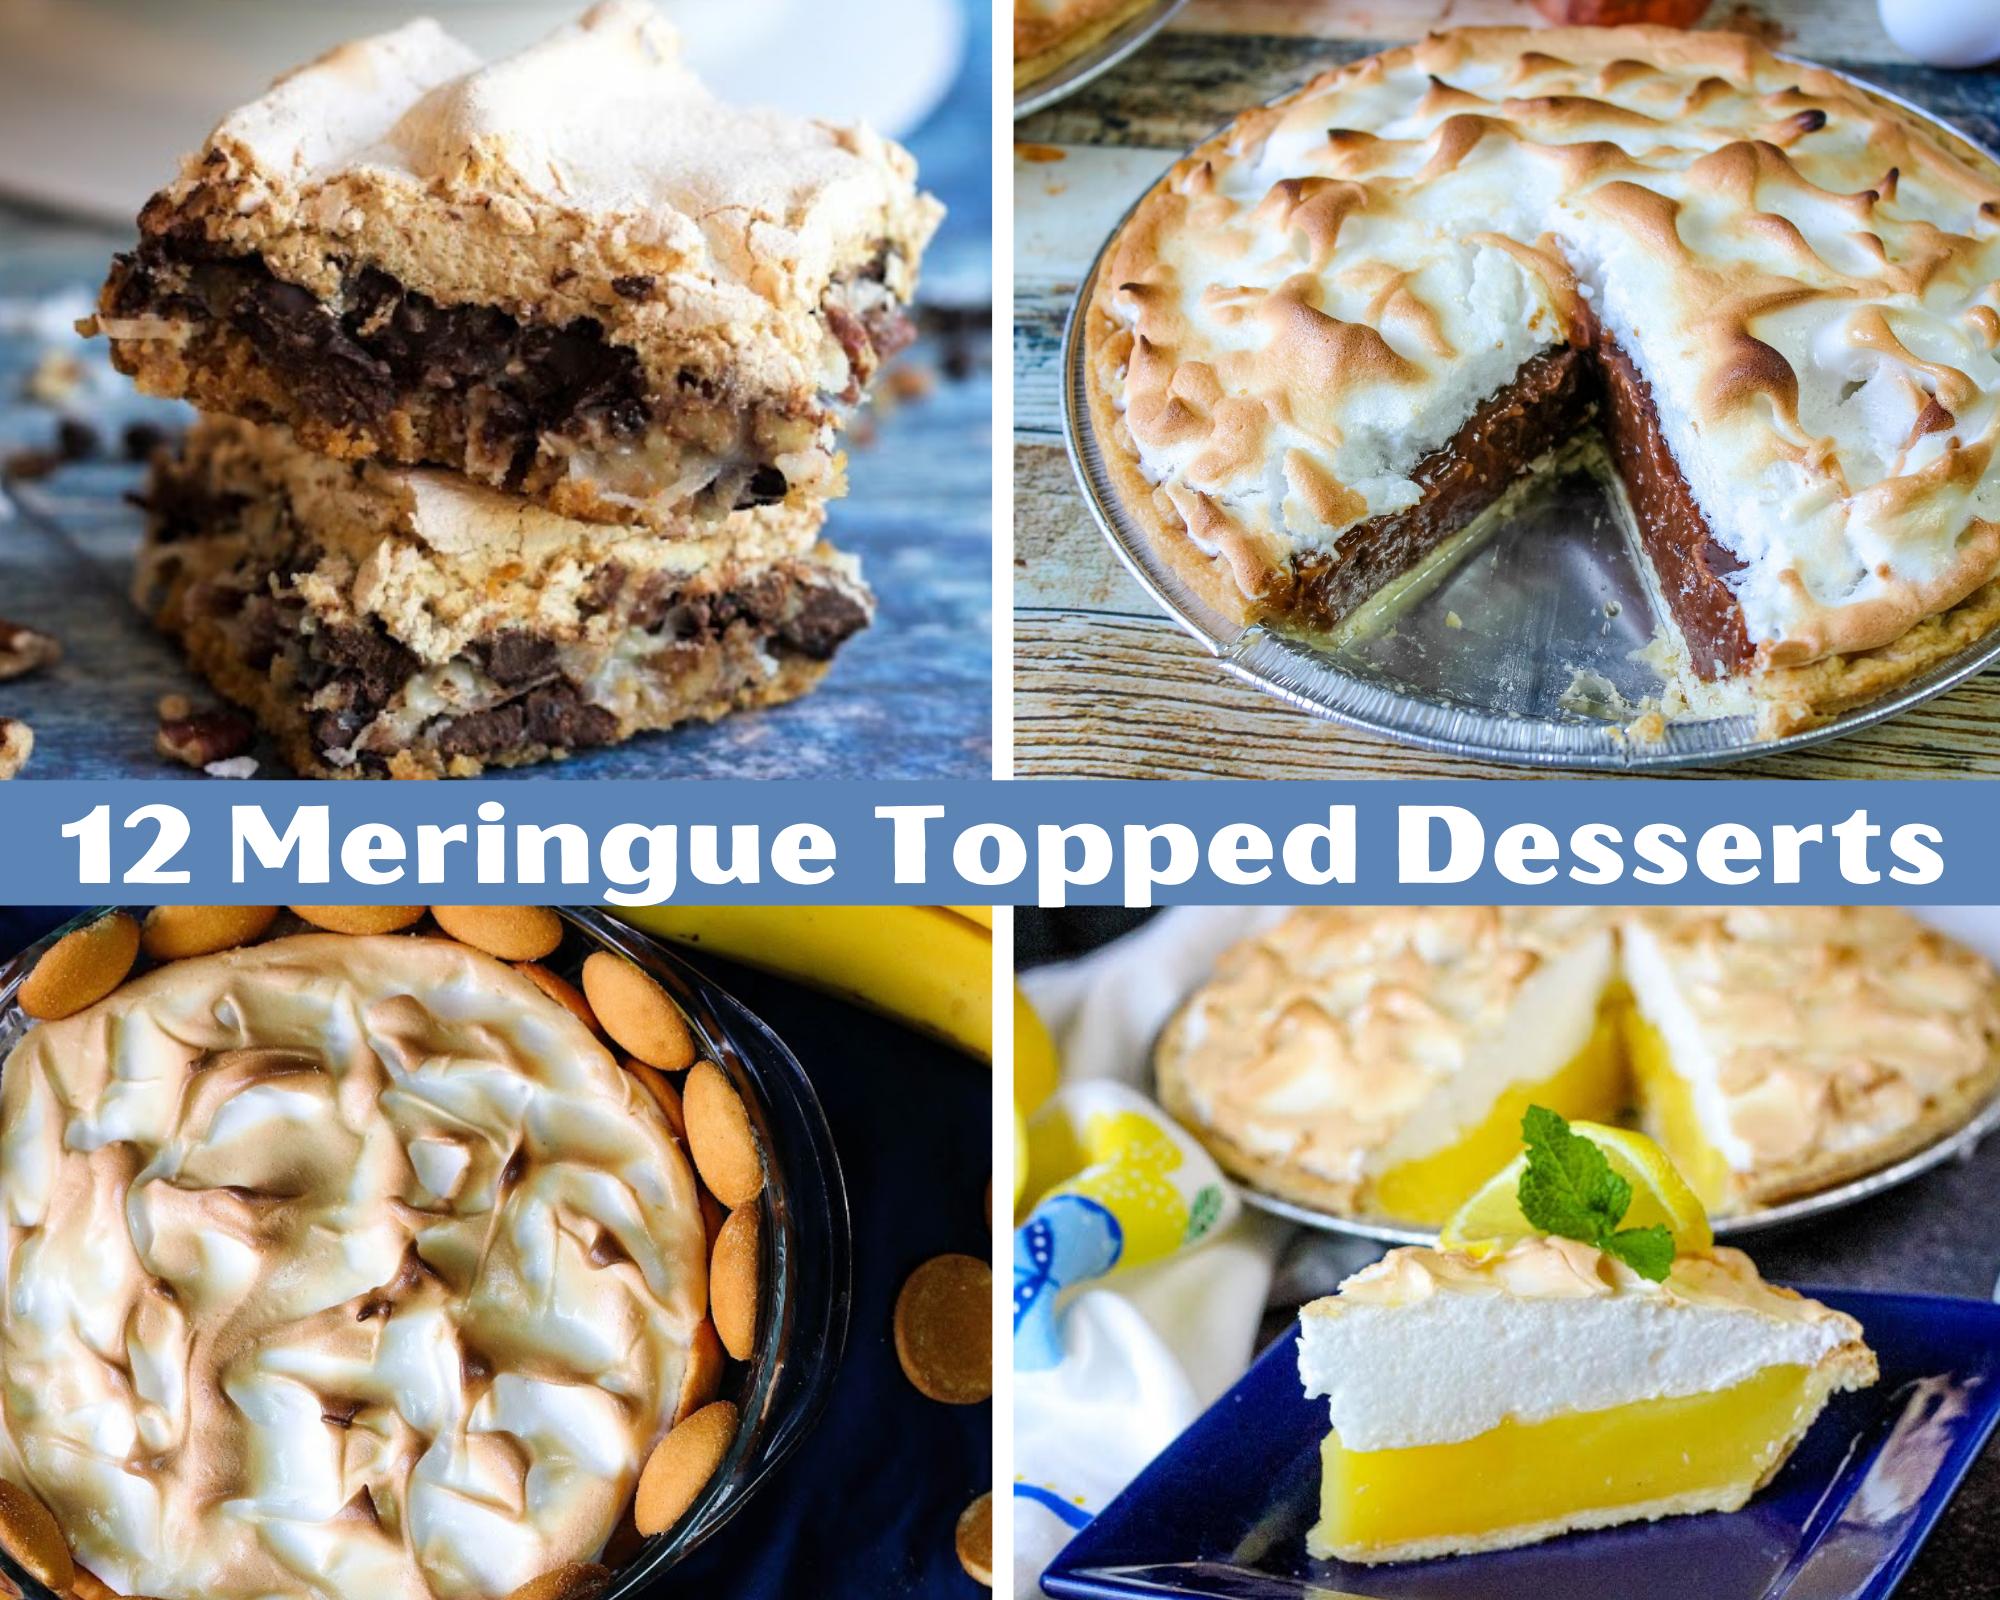 meringue topped desserts